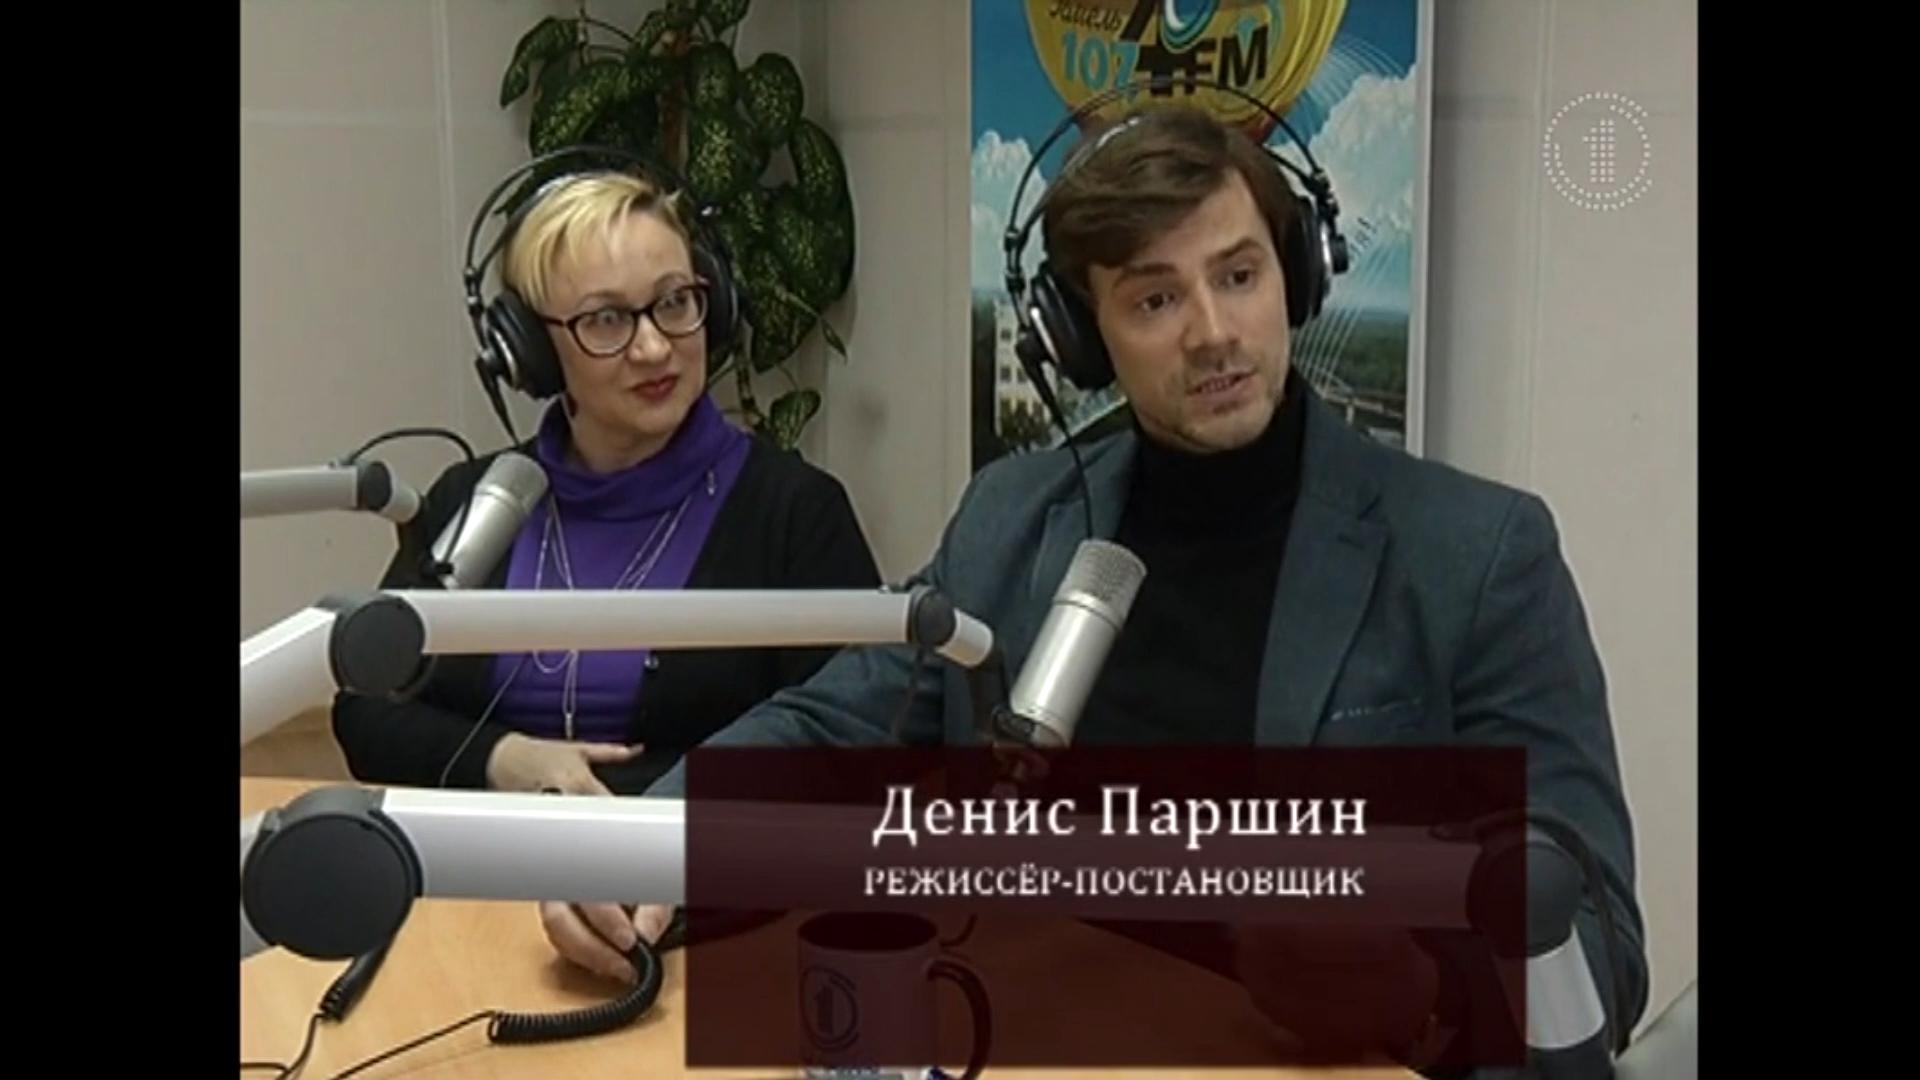 театр2.mp4_snapshot_01.51_[2018.03.27_23.44.51]